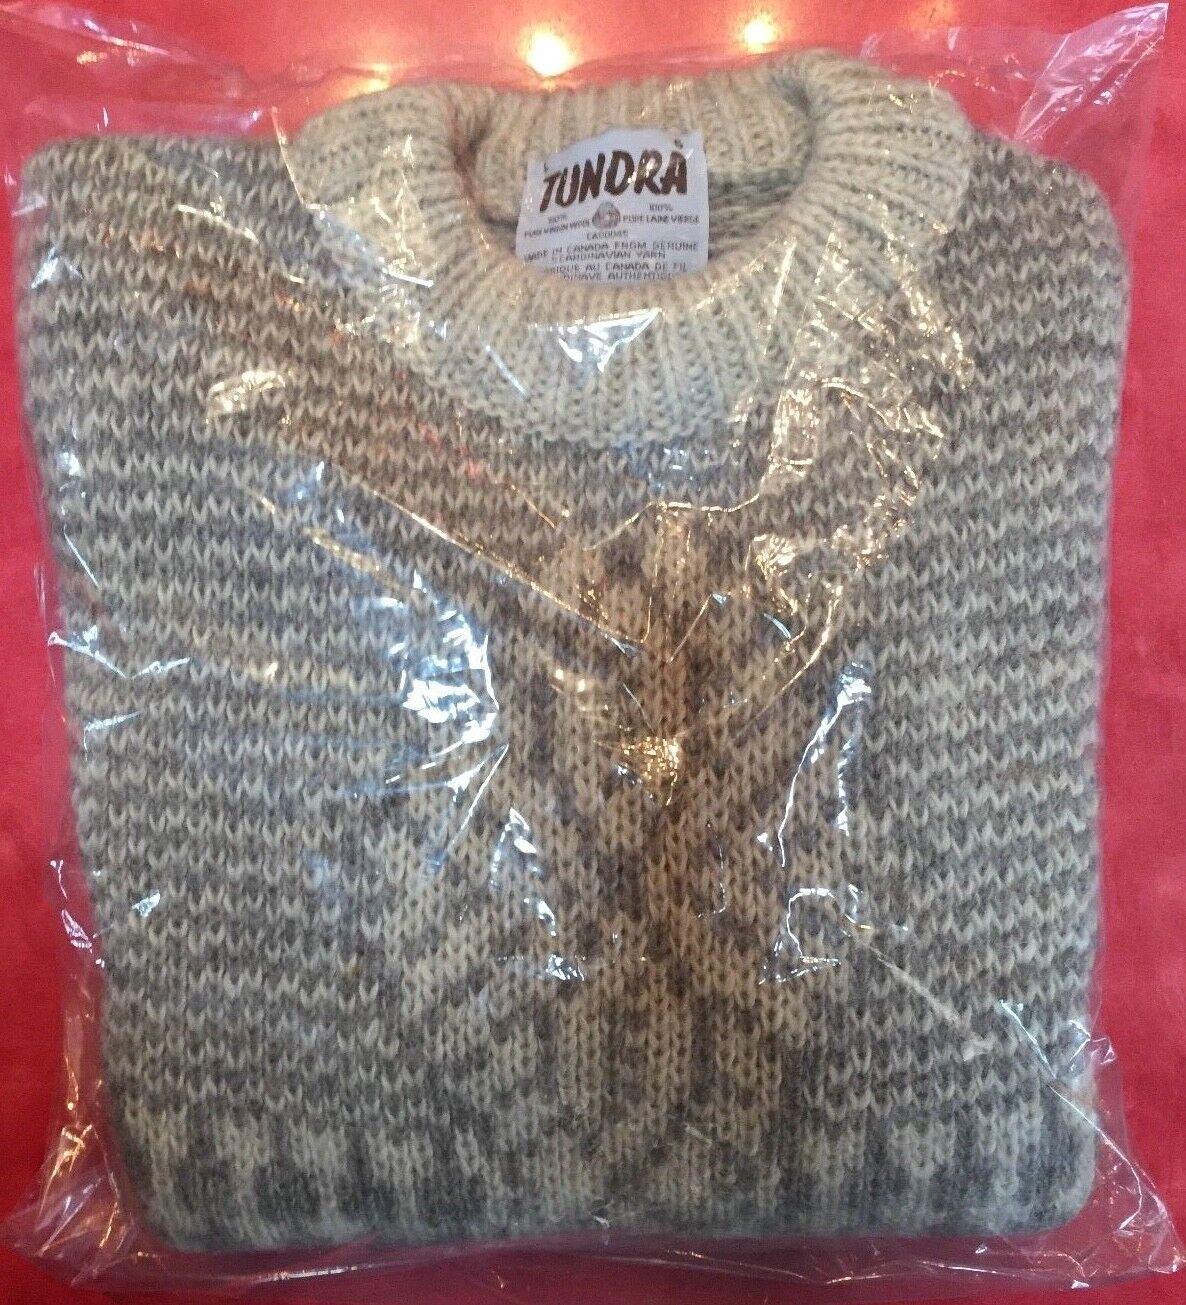 TUNDRA  Herren Pullover 100% Virgin Wool CANADA grau  Sweater  L NWOT